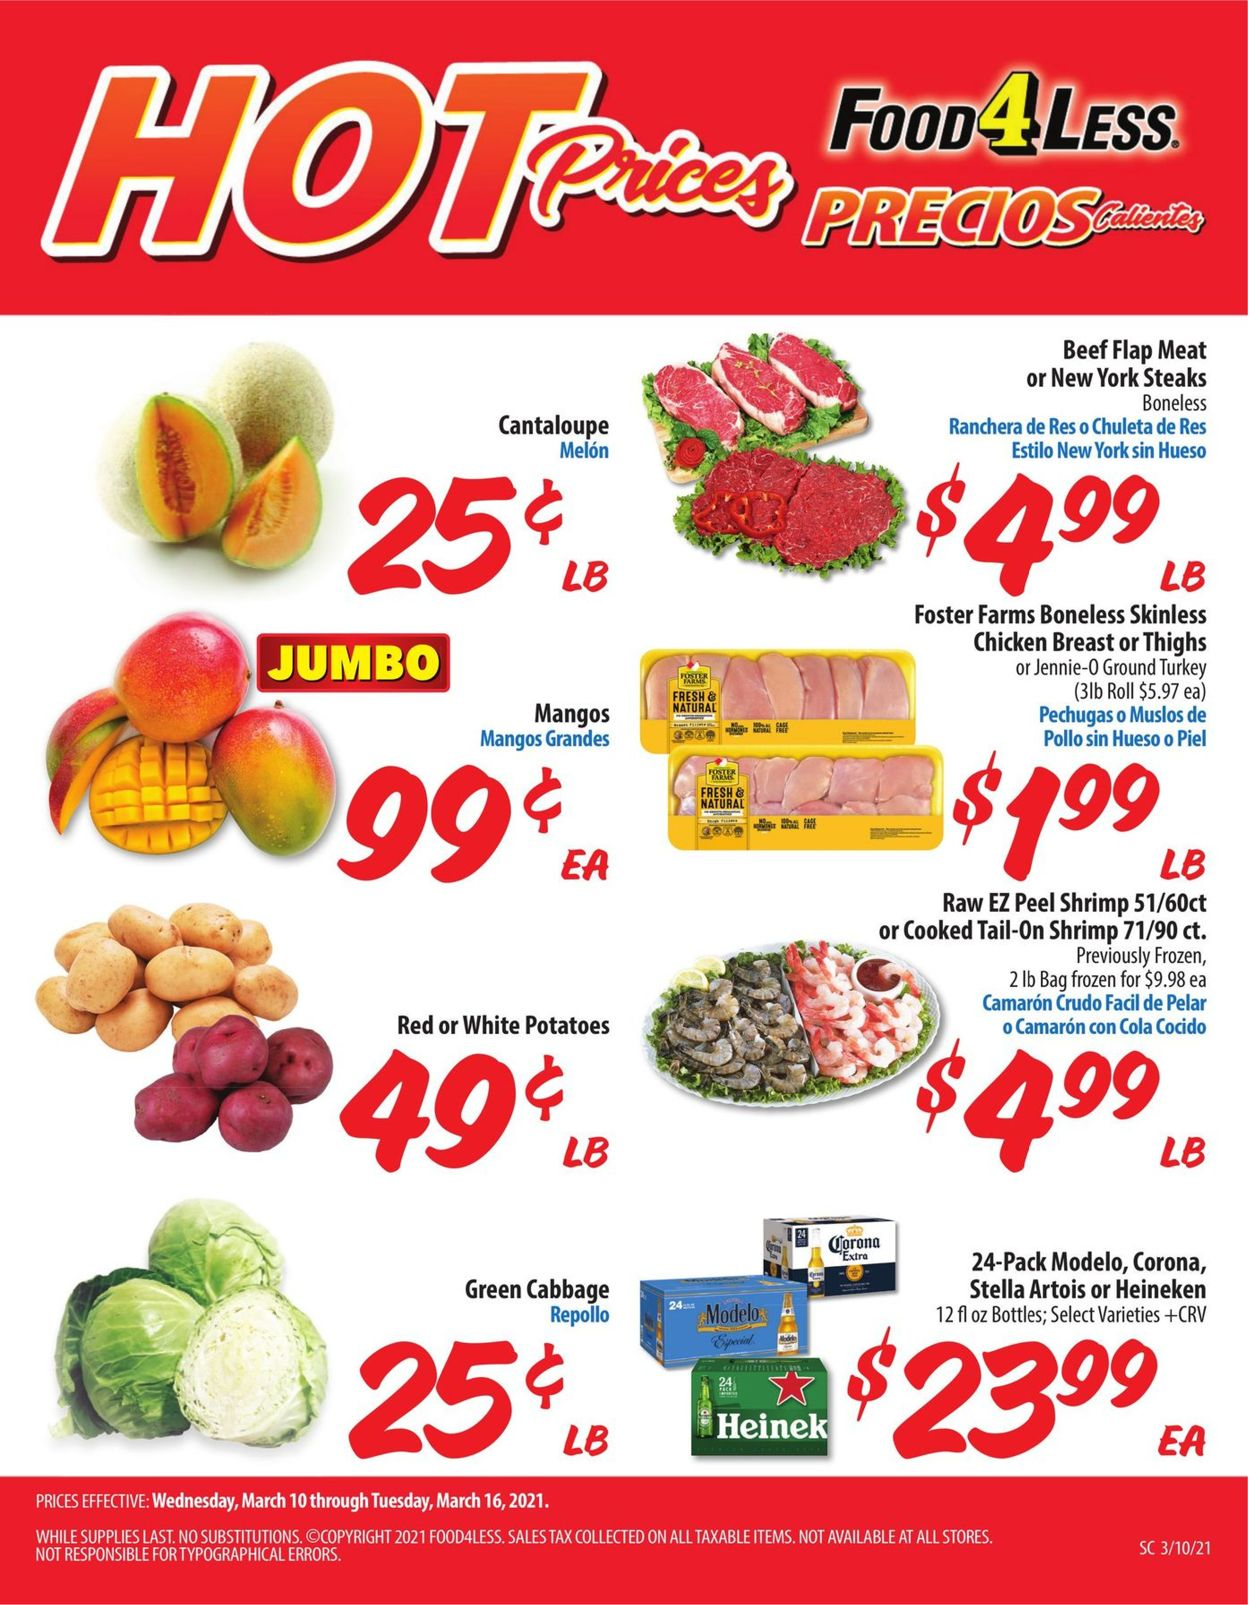 Food 4 Less Weekly Ad Circular - valid 03/10-03/16/2021